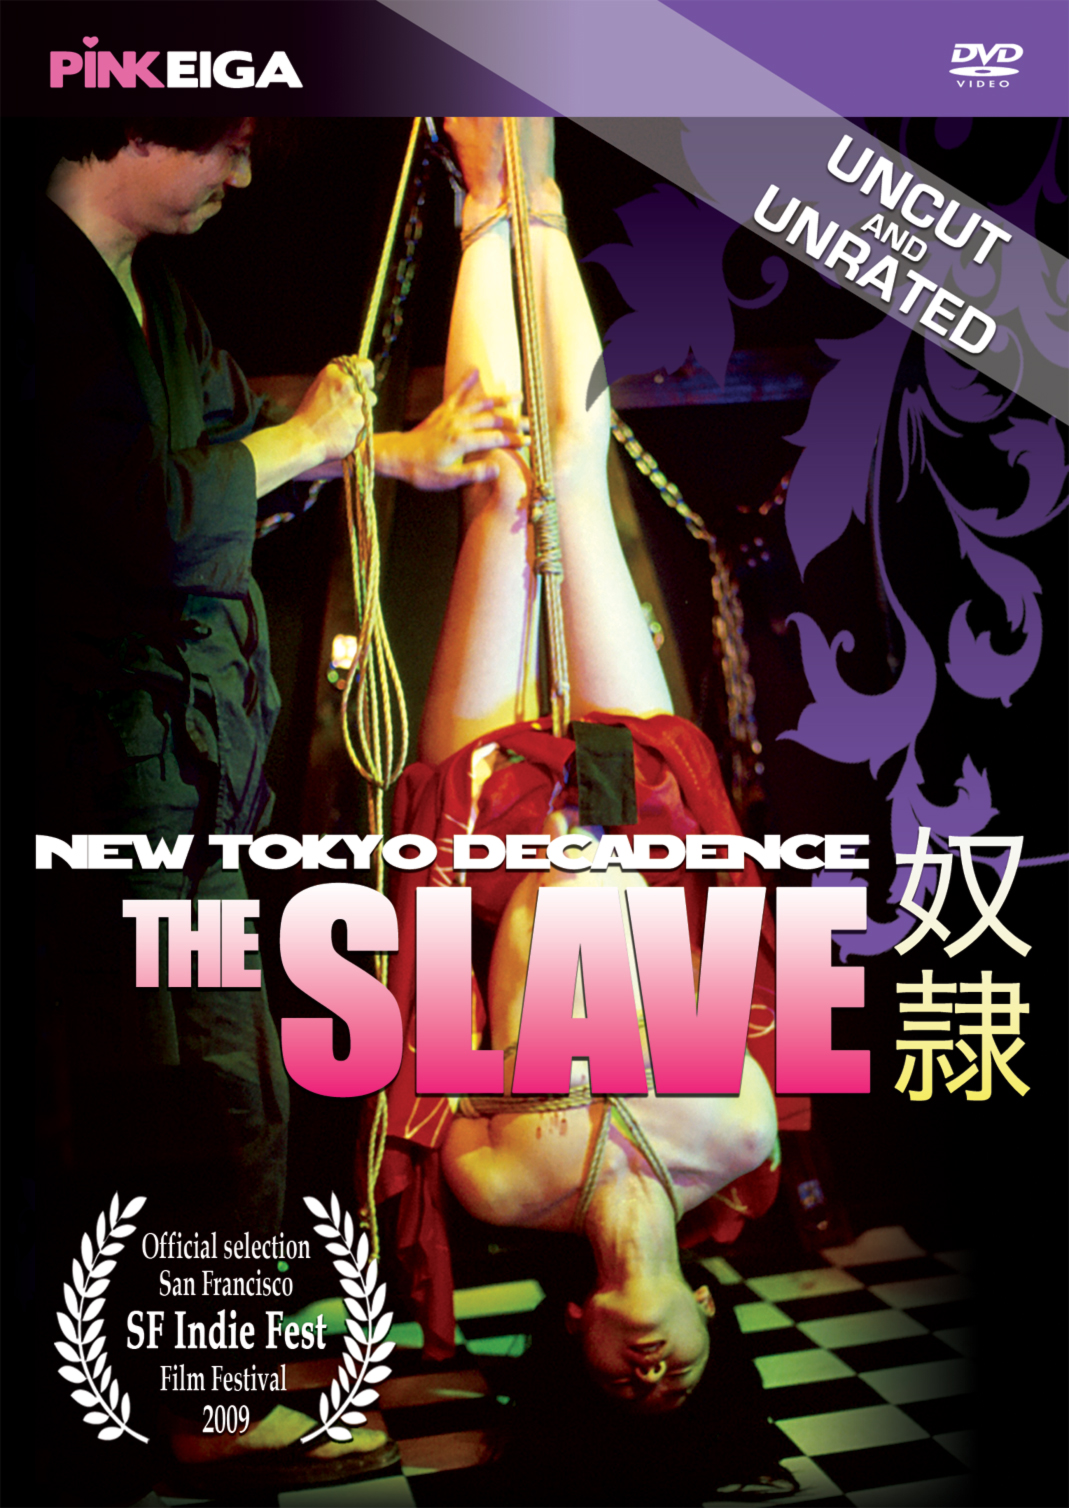 New Tokyo Decadence The Slave Box art